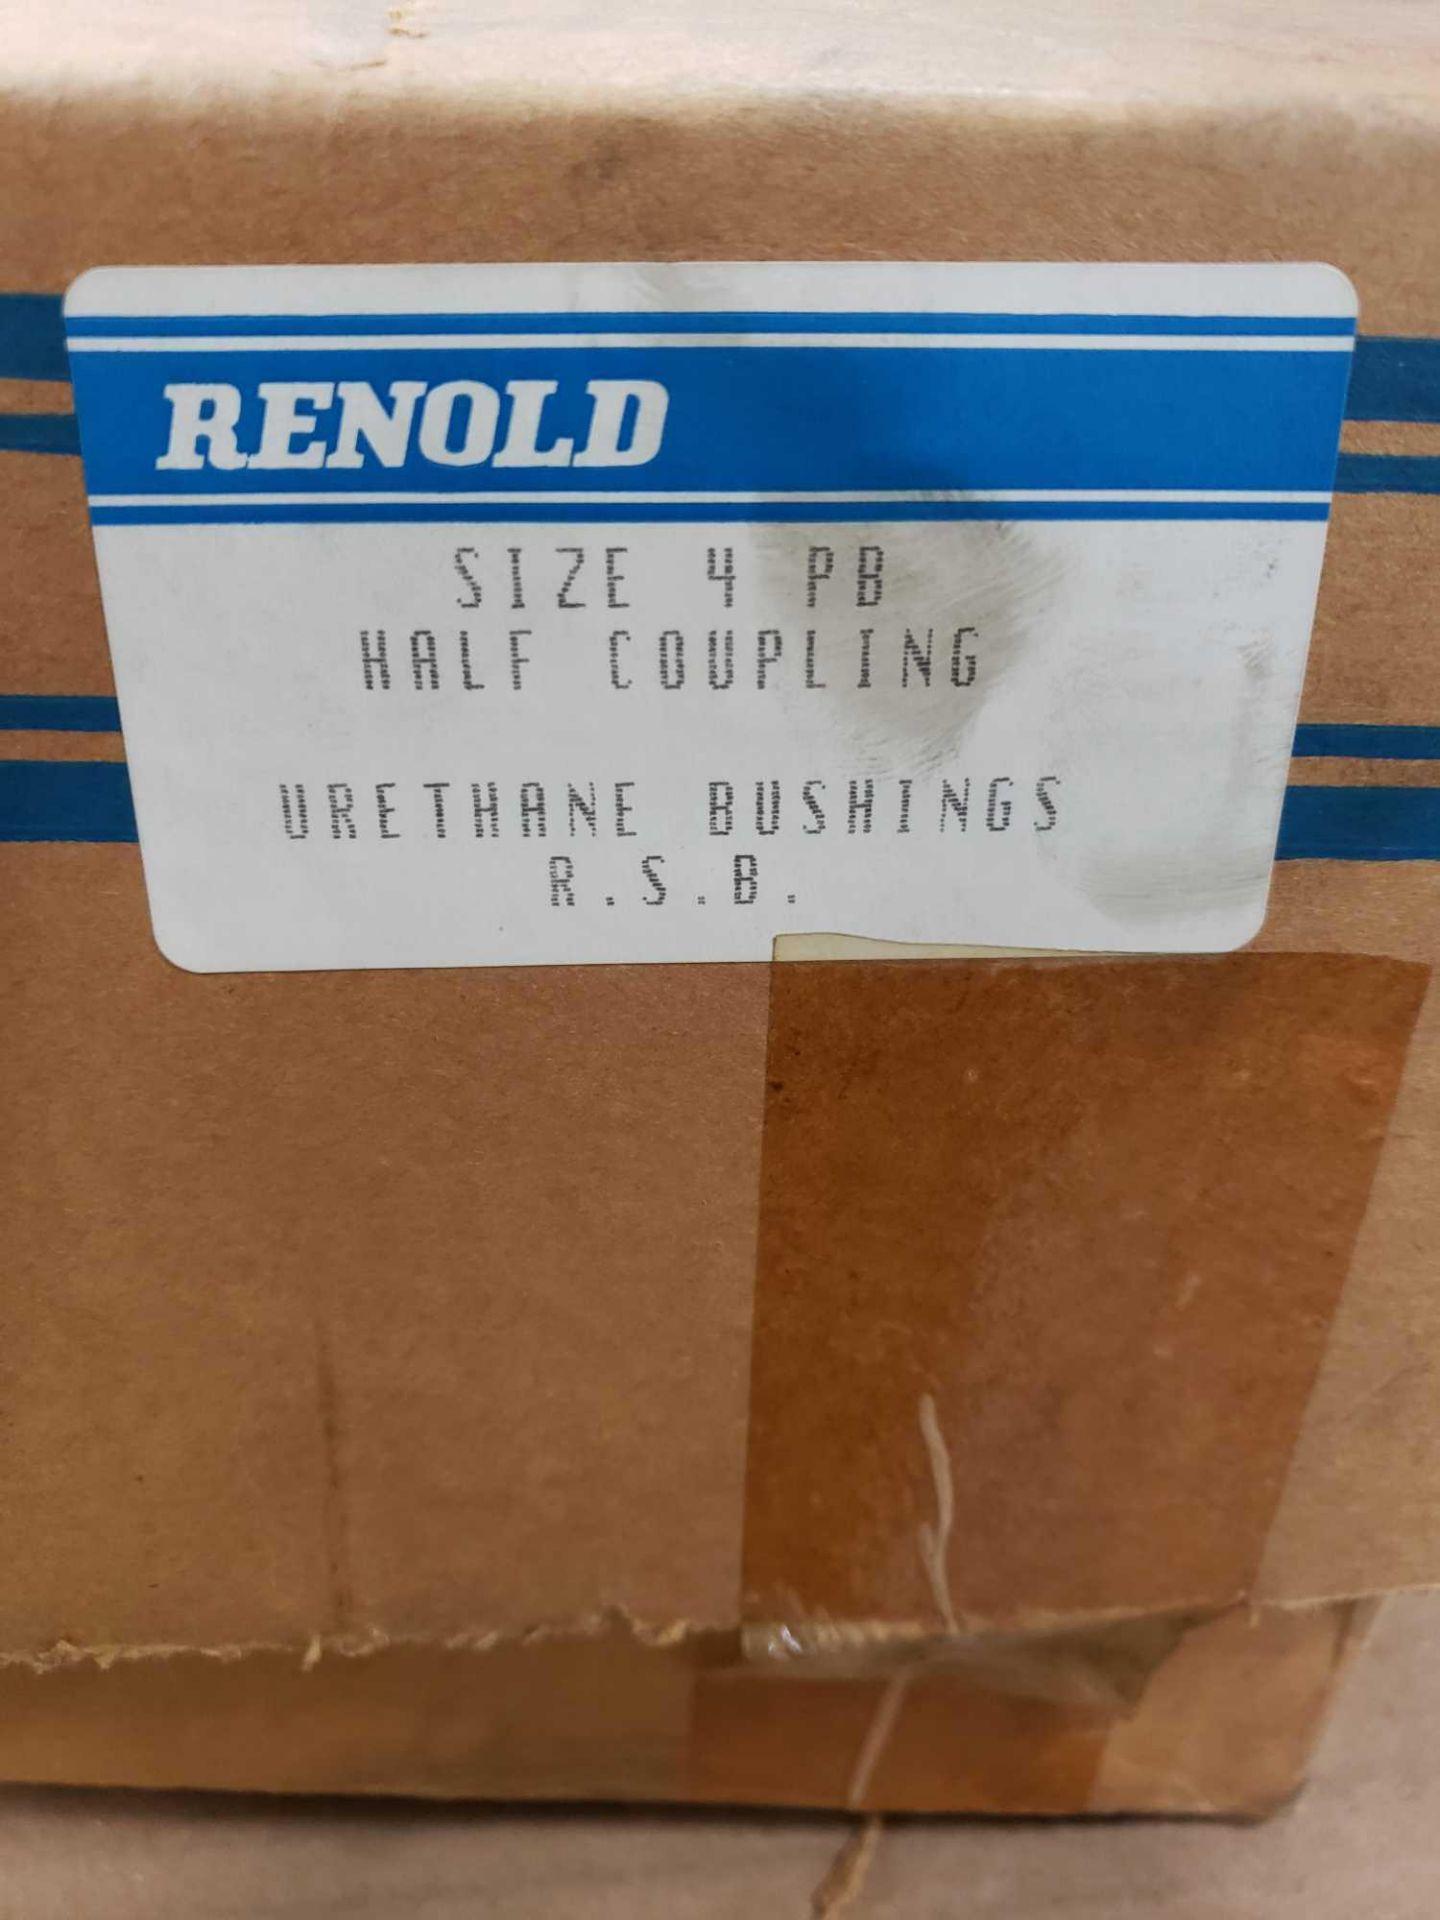 Lot 157 - Renold half coupling size 4 PB urethane bushing. New in box.